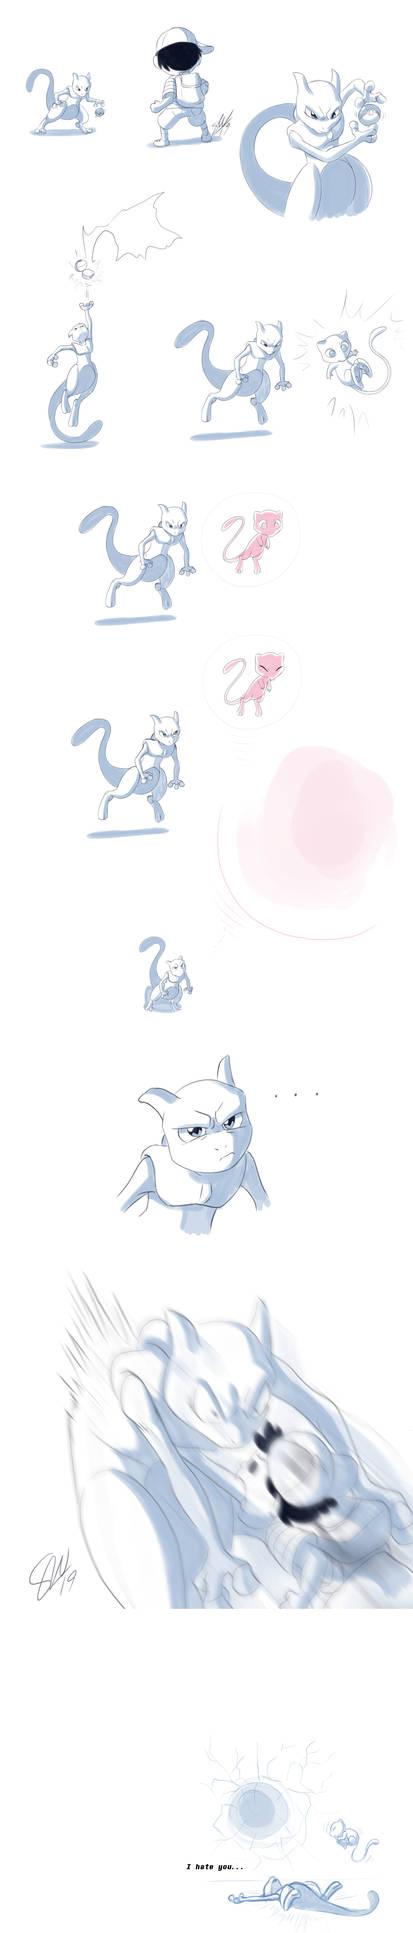 Mew is a bad battle partner